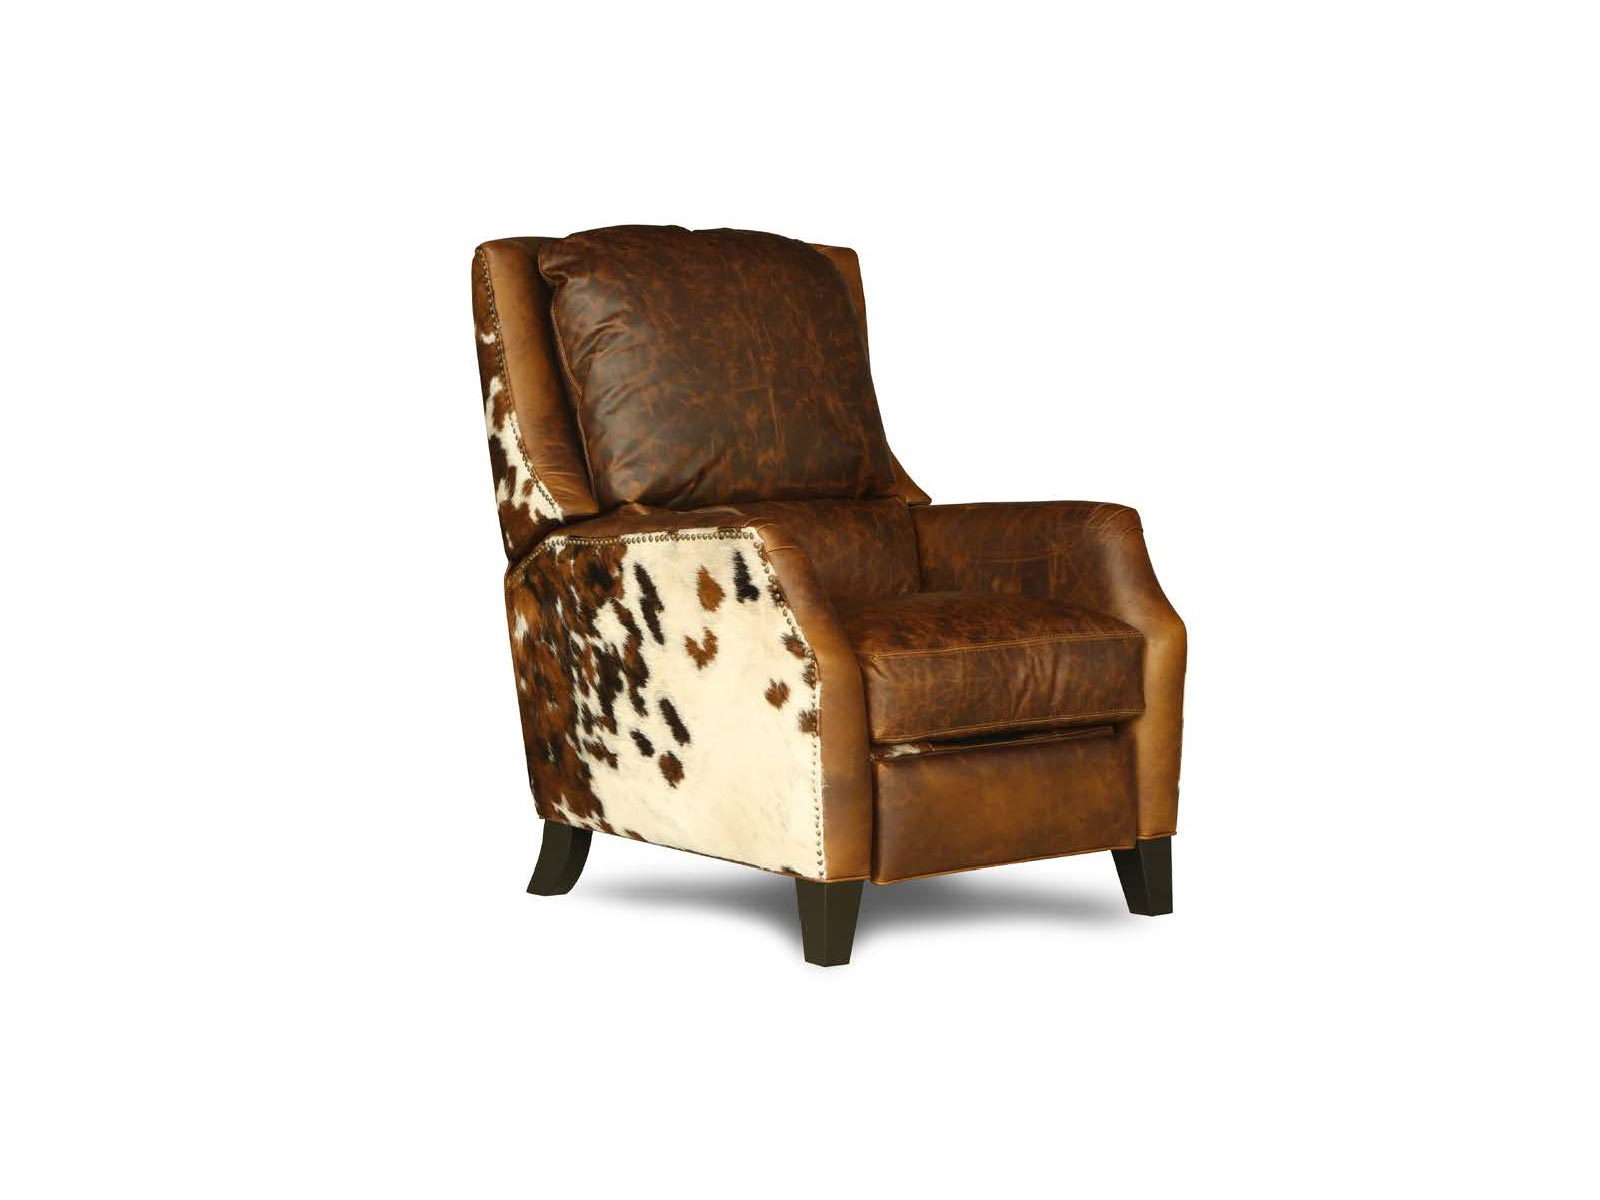 TERLCO lodge chair